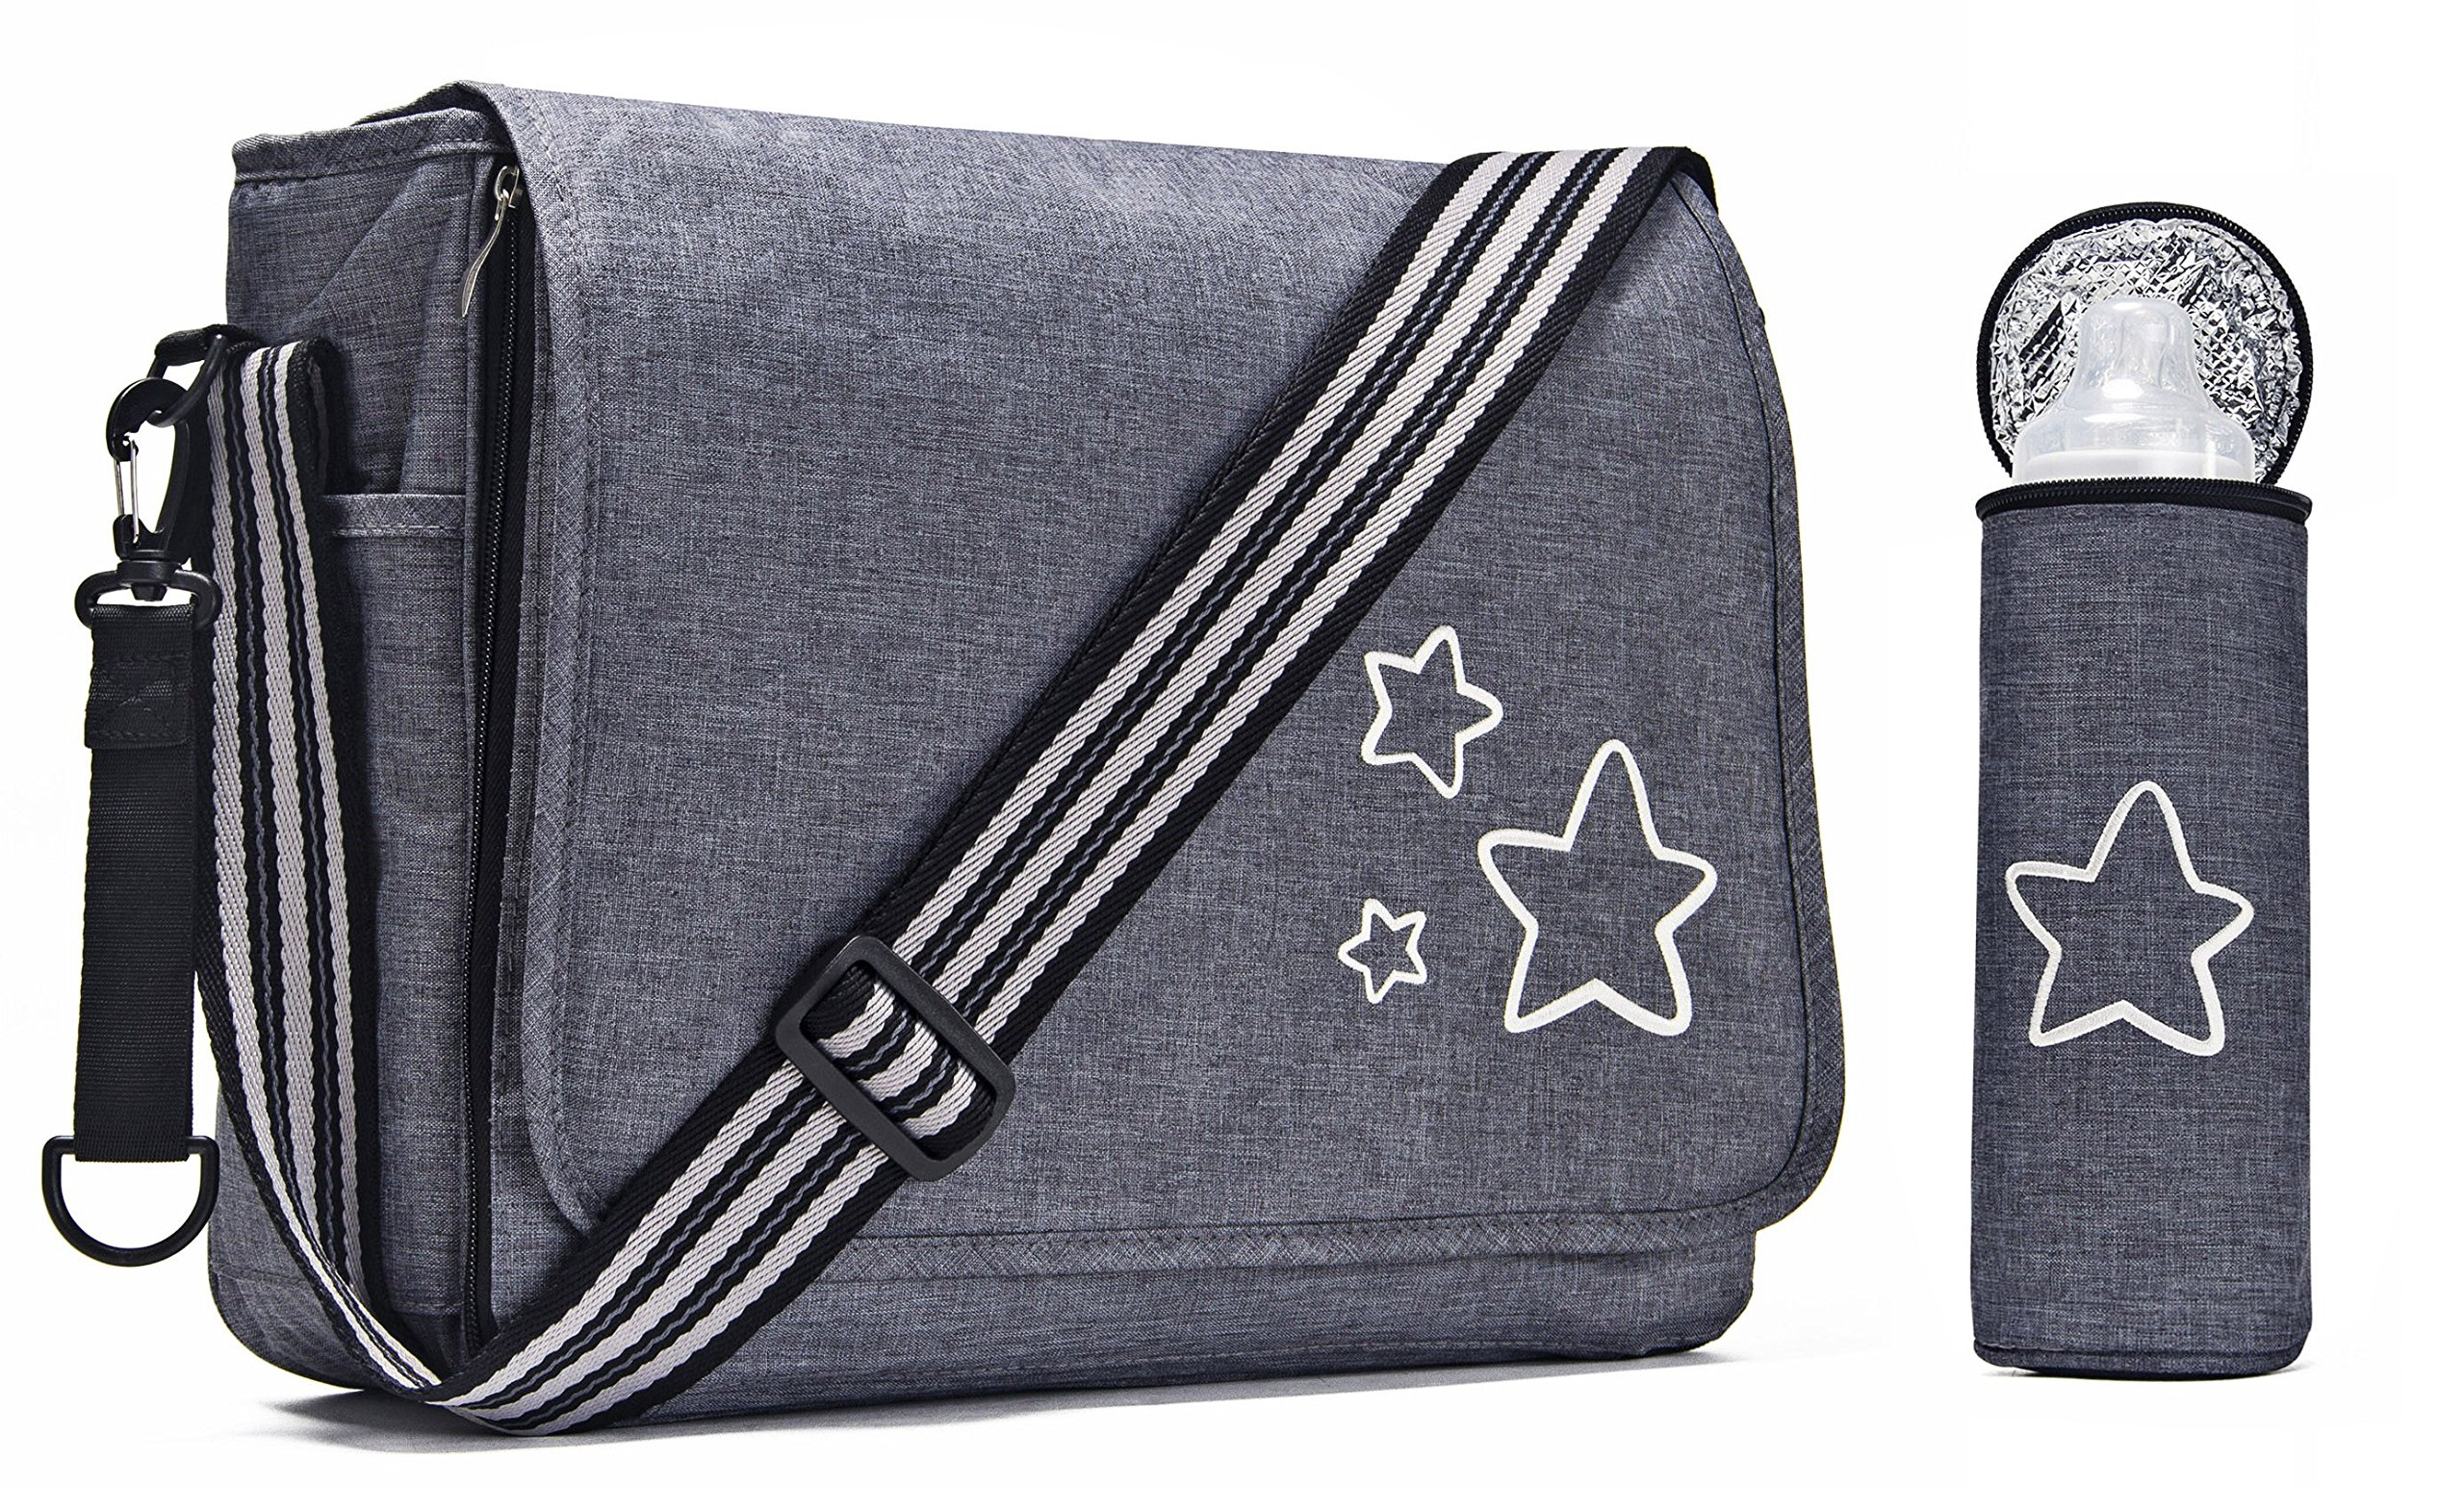 Amelitory Baby Stroller Organizer Diaper Bag,Adventure Messenger Diaper Bag with Cup Holders and Shoulder Strap (MessengerBag, Grey)